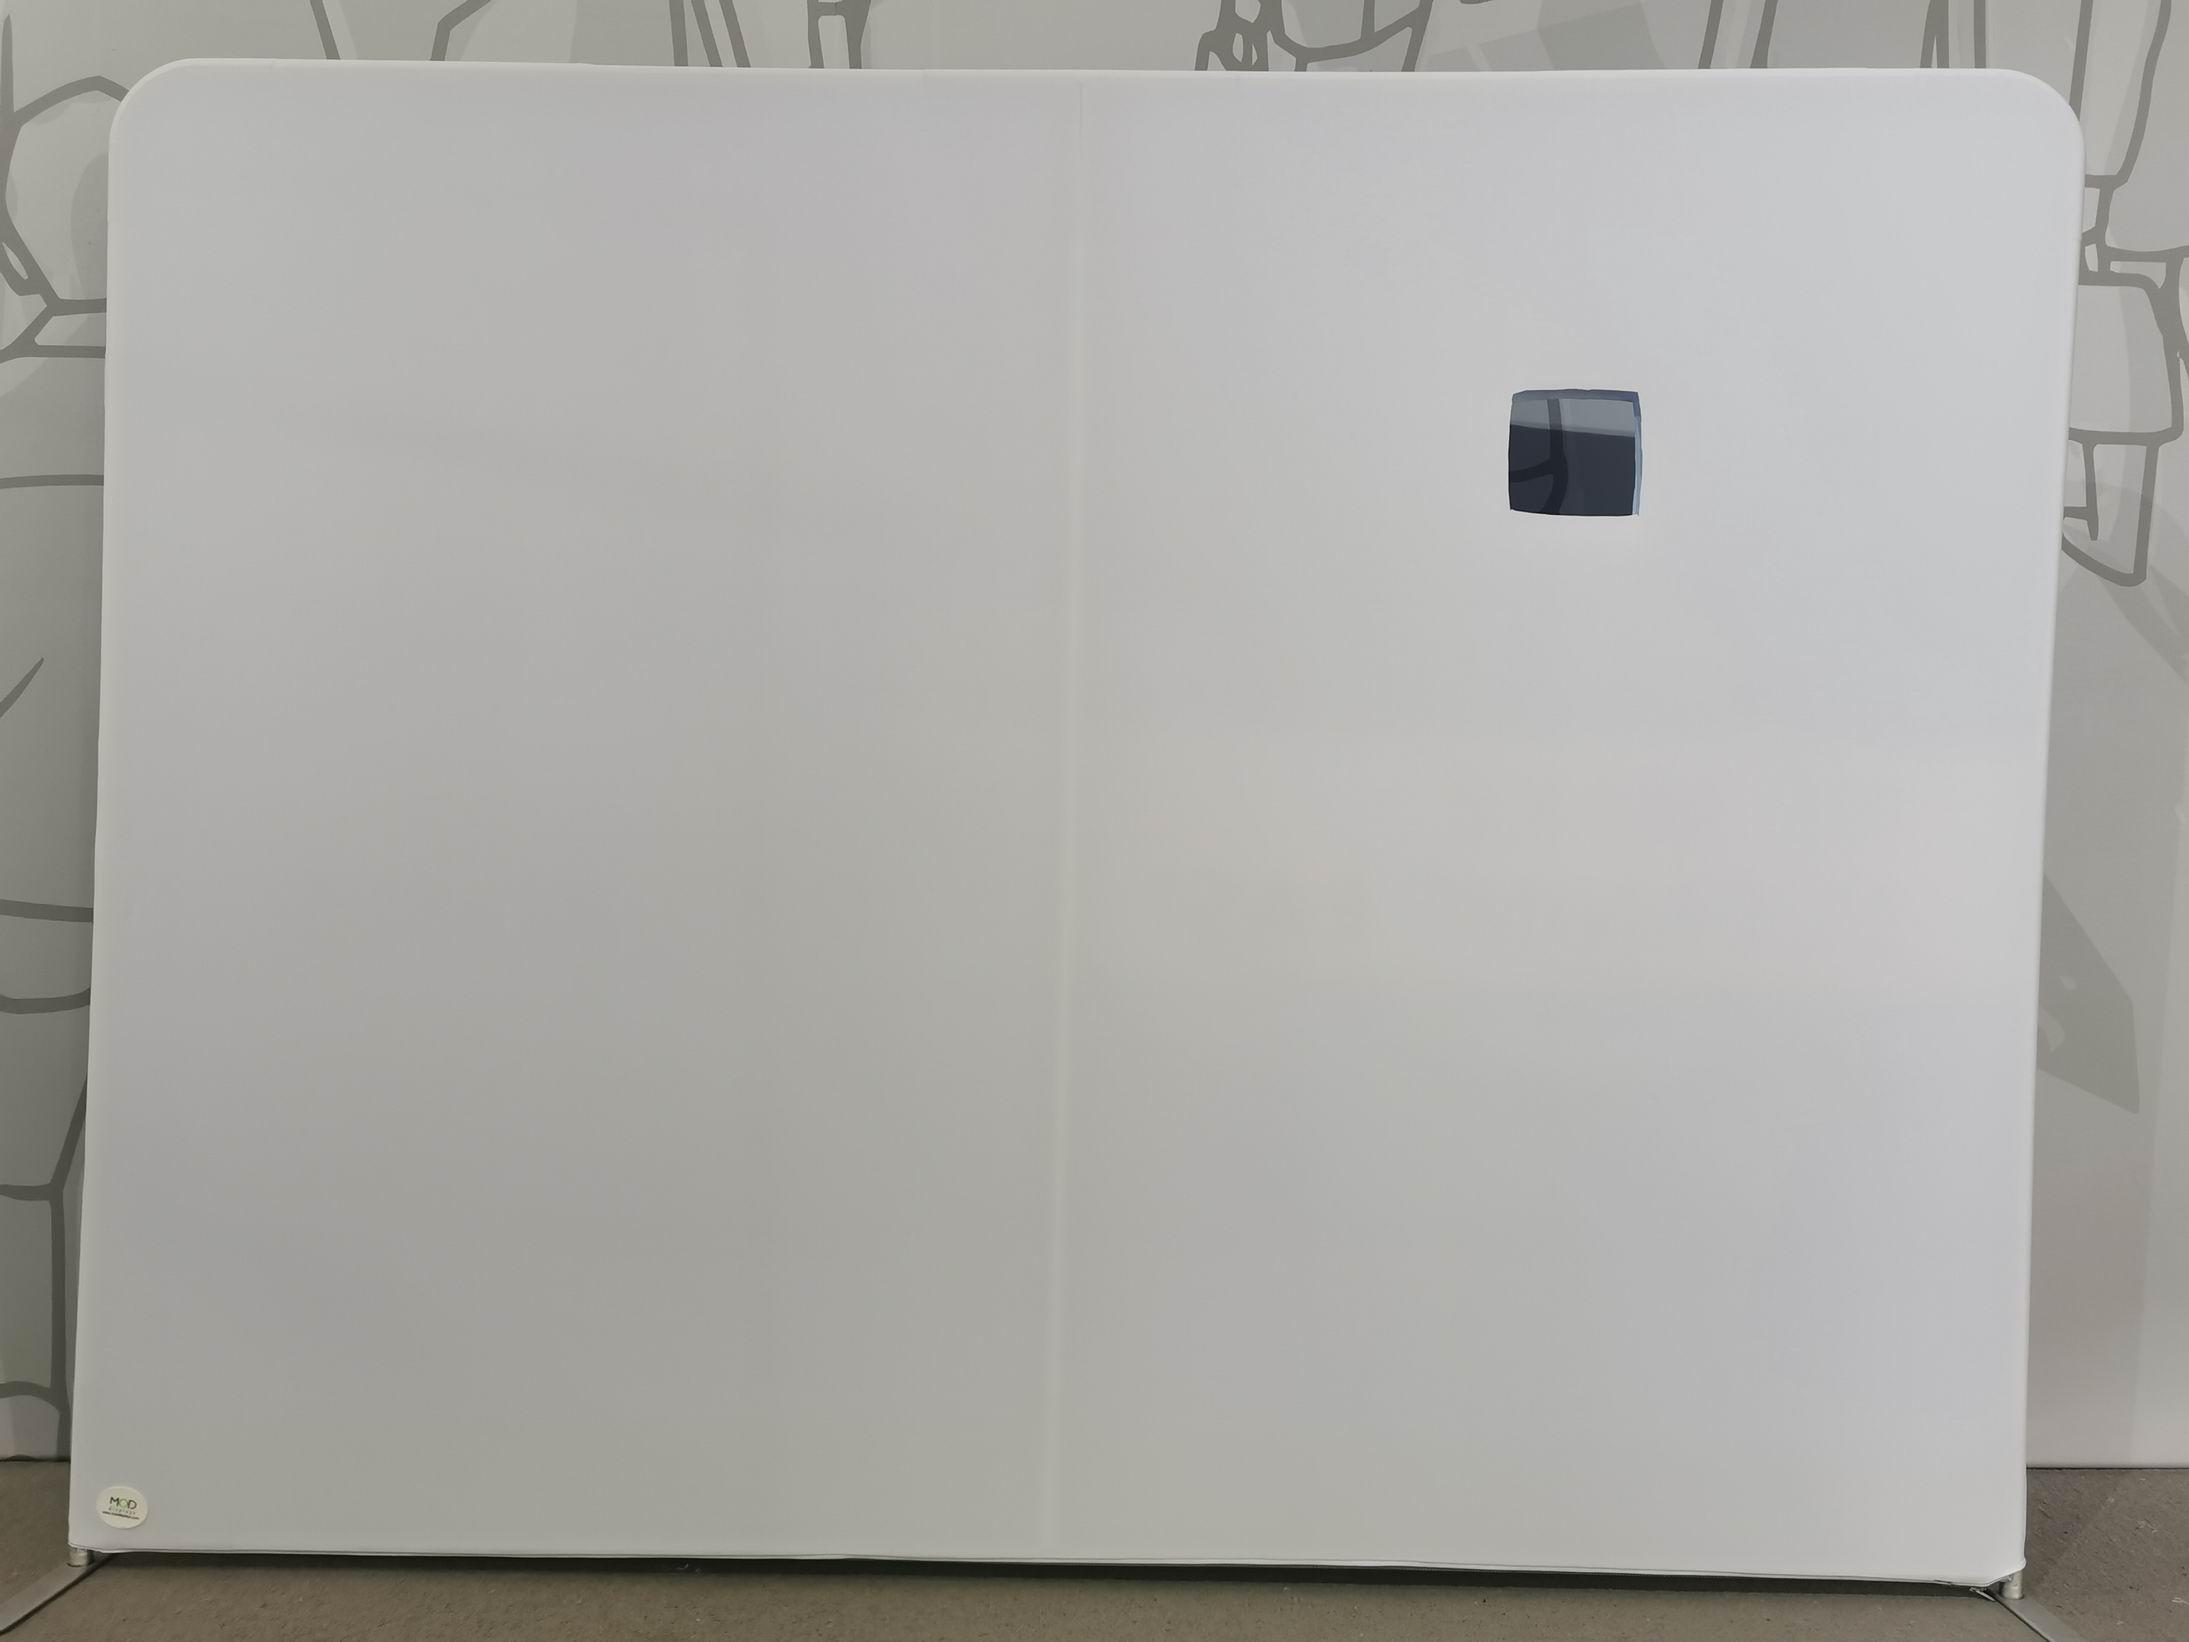 10ft Wavelne Media Trade Show Display back wall back production photo